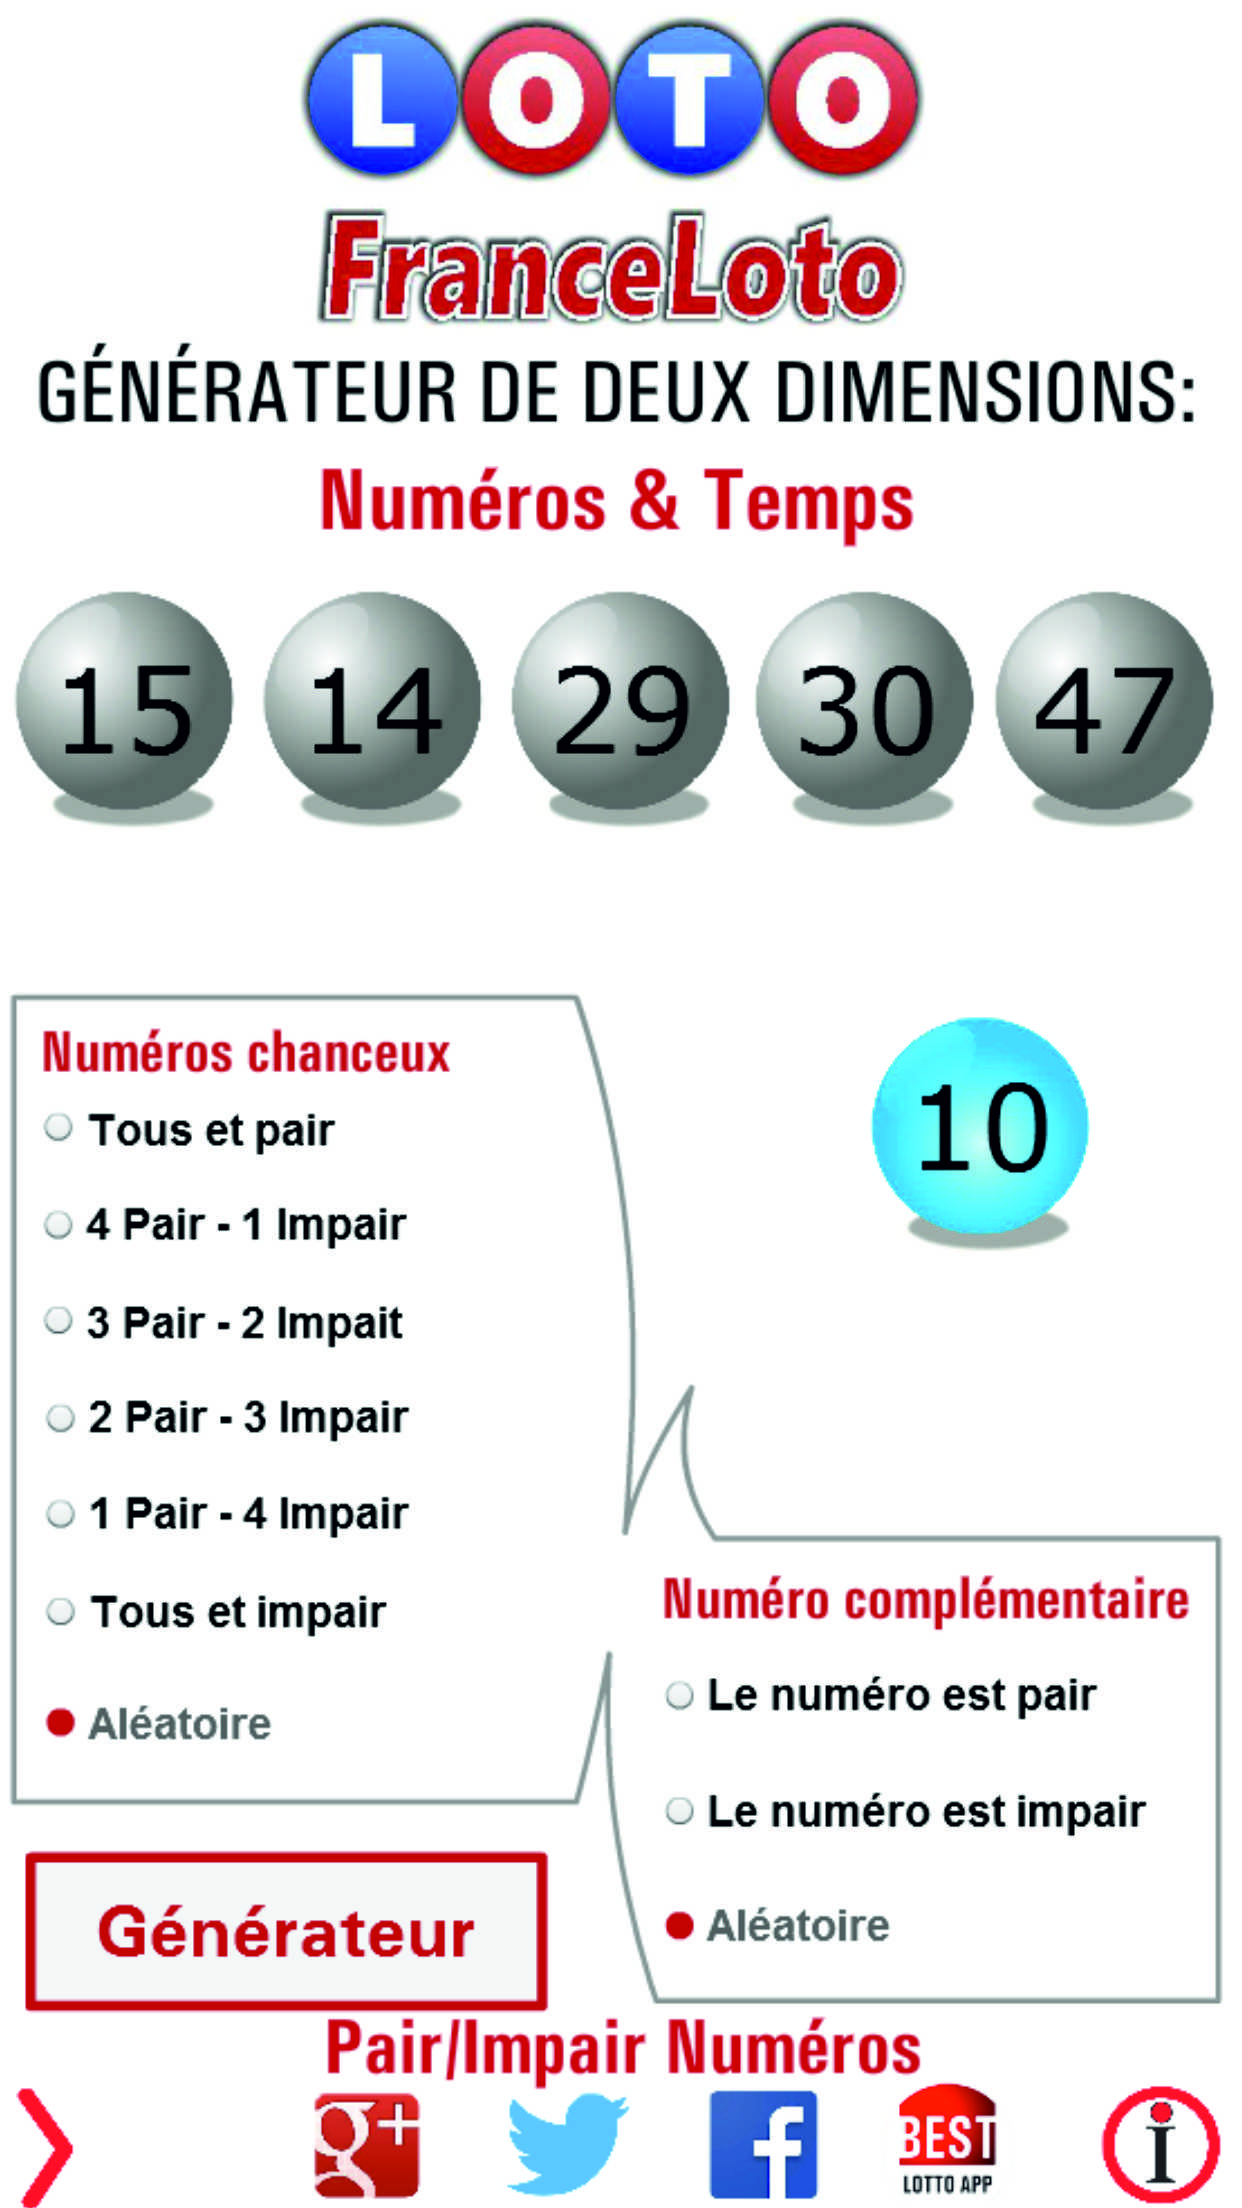 France Loto - Loto gagnant, Résultats, Rapports, Gains tirage